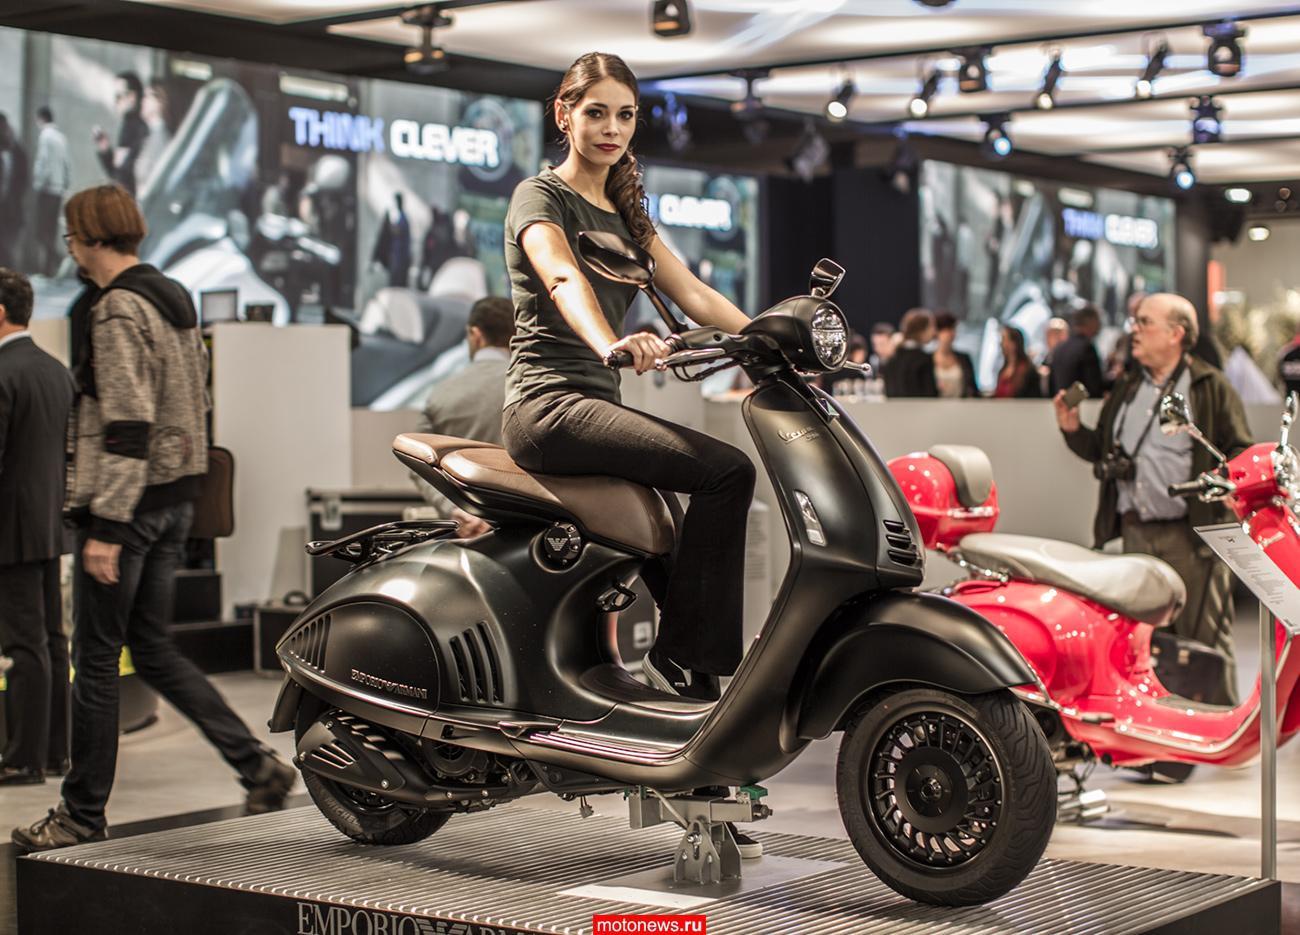 Emporio Armani Vespa 946 дебютировала на EICMA 2015